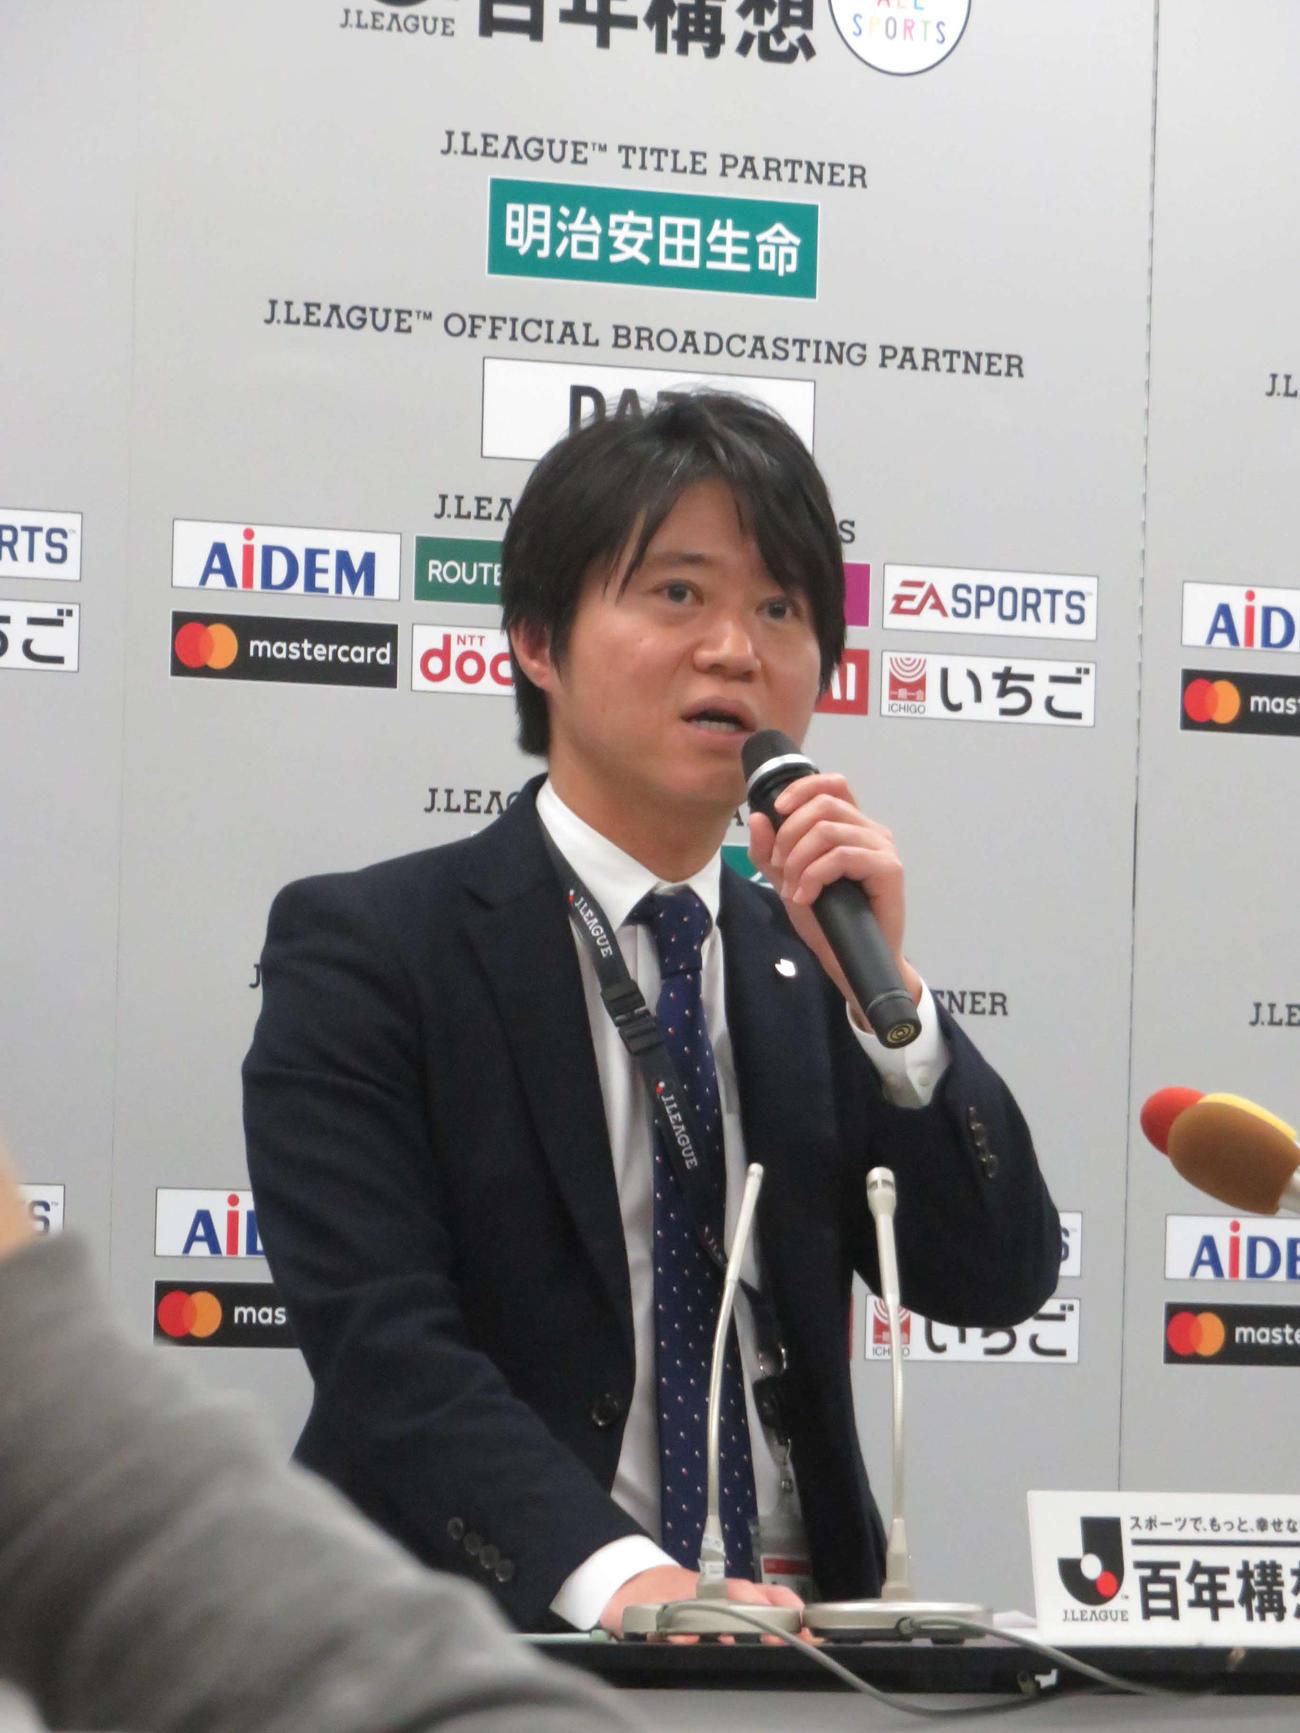 Jリーグ理事会会見の中止をアナウンスする勝沢健広報部長(2020年3月17日撮影)